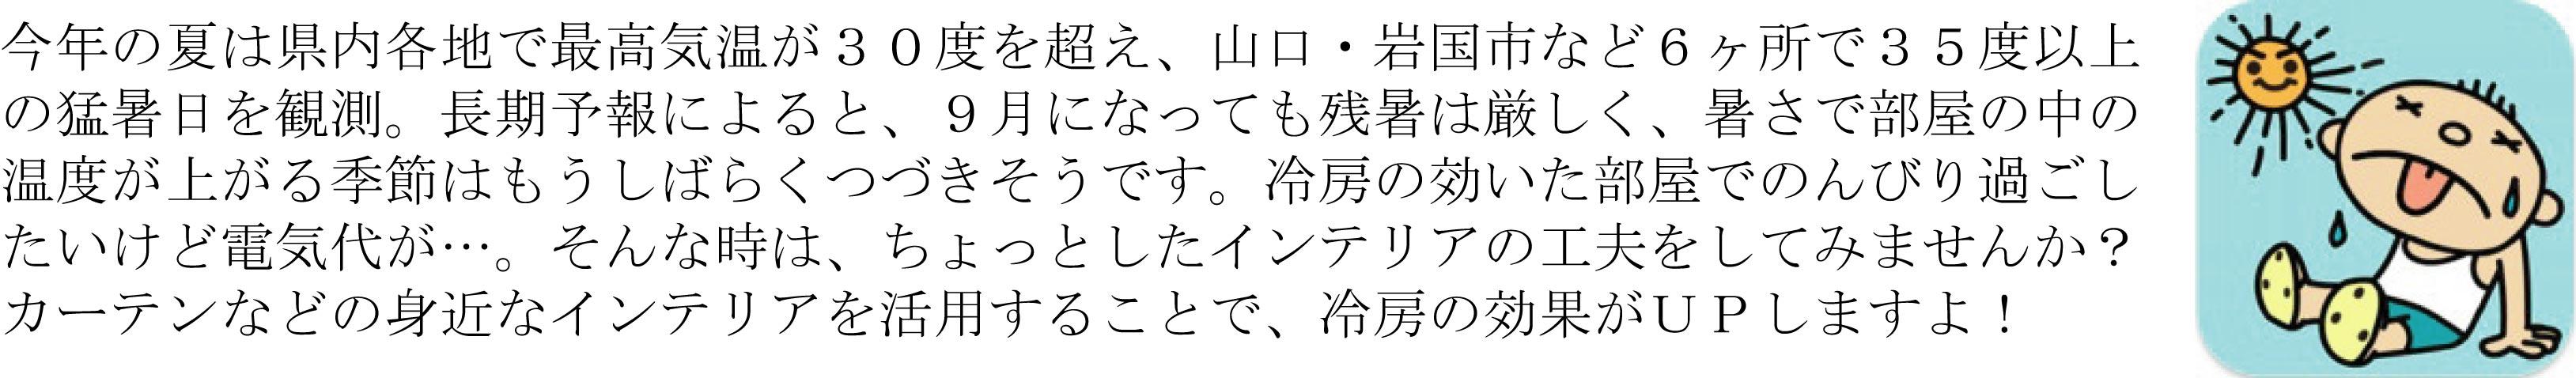 KuraSi-natu-sin75-08.jpg